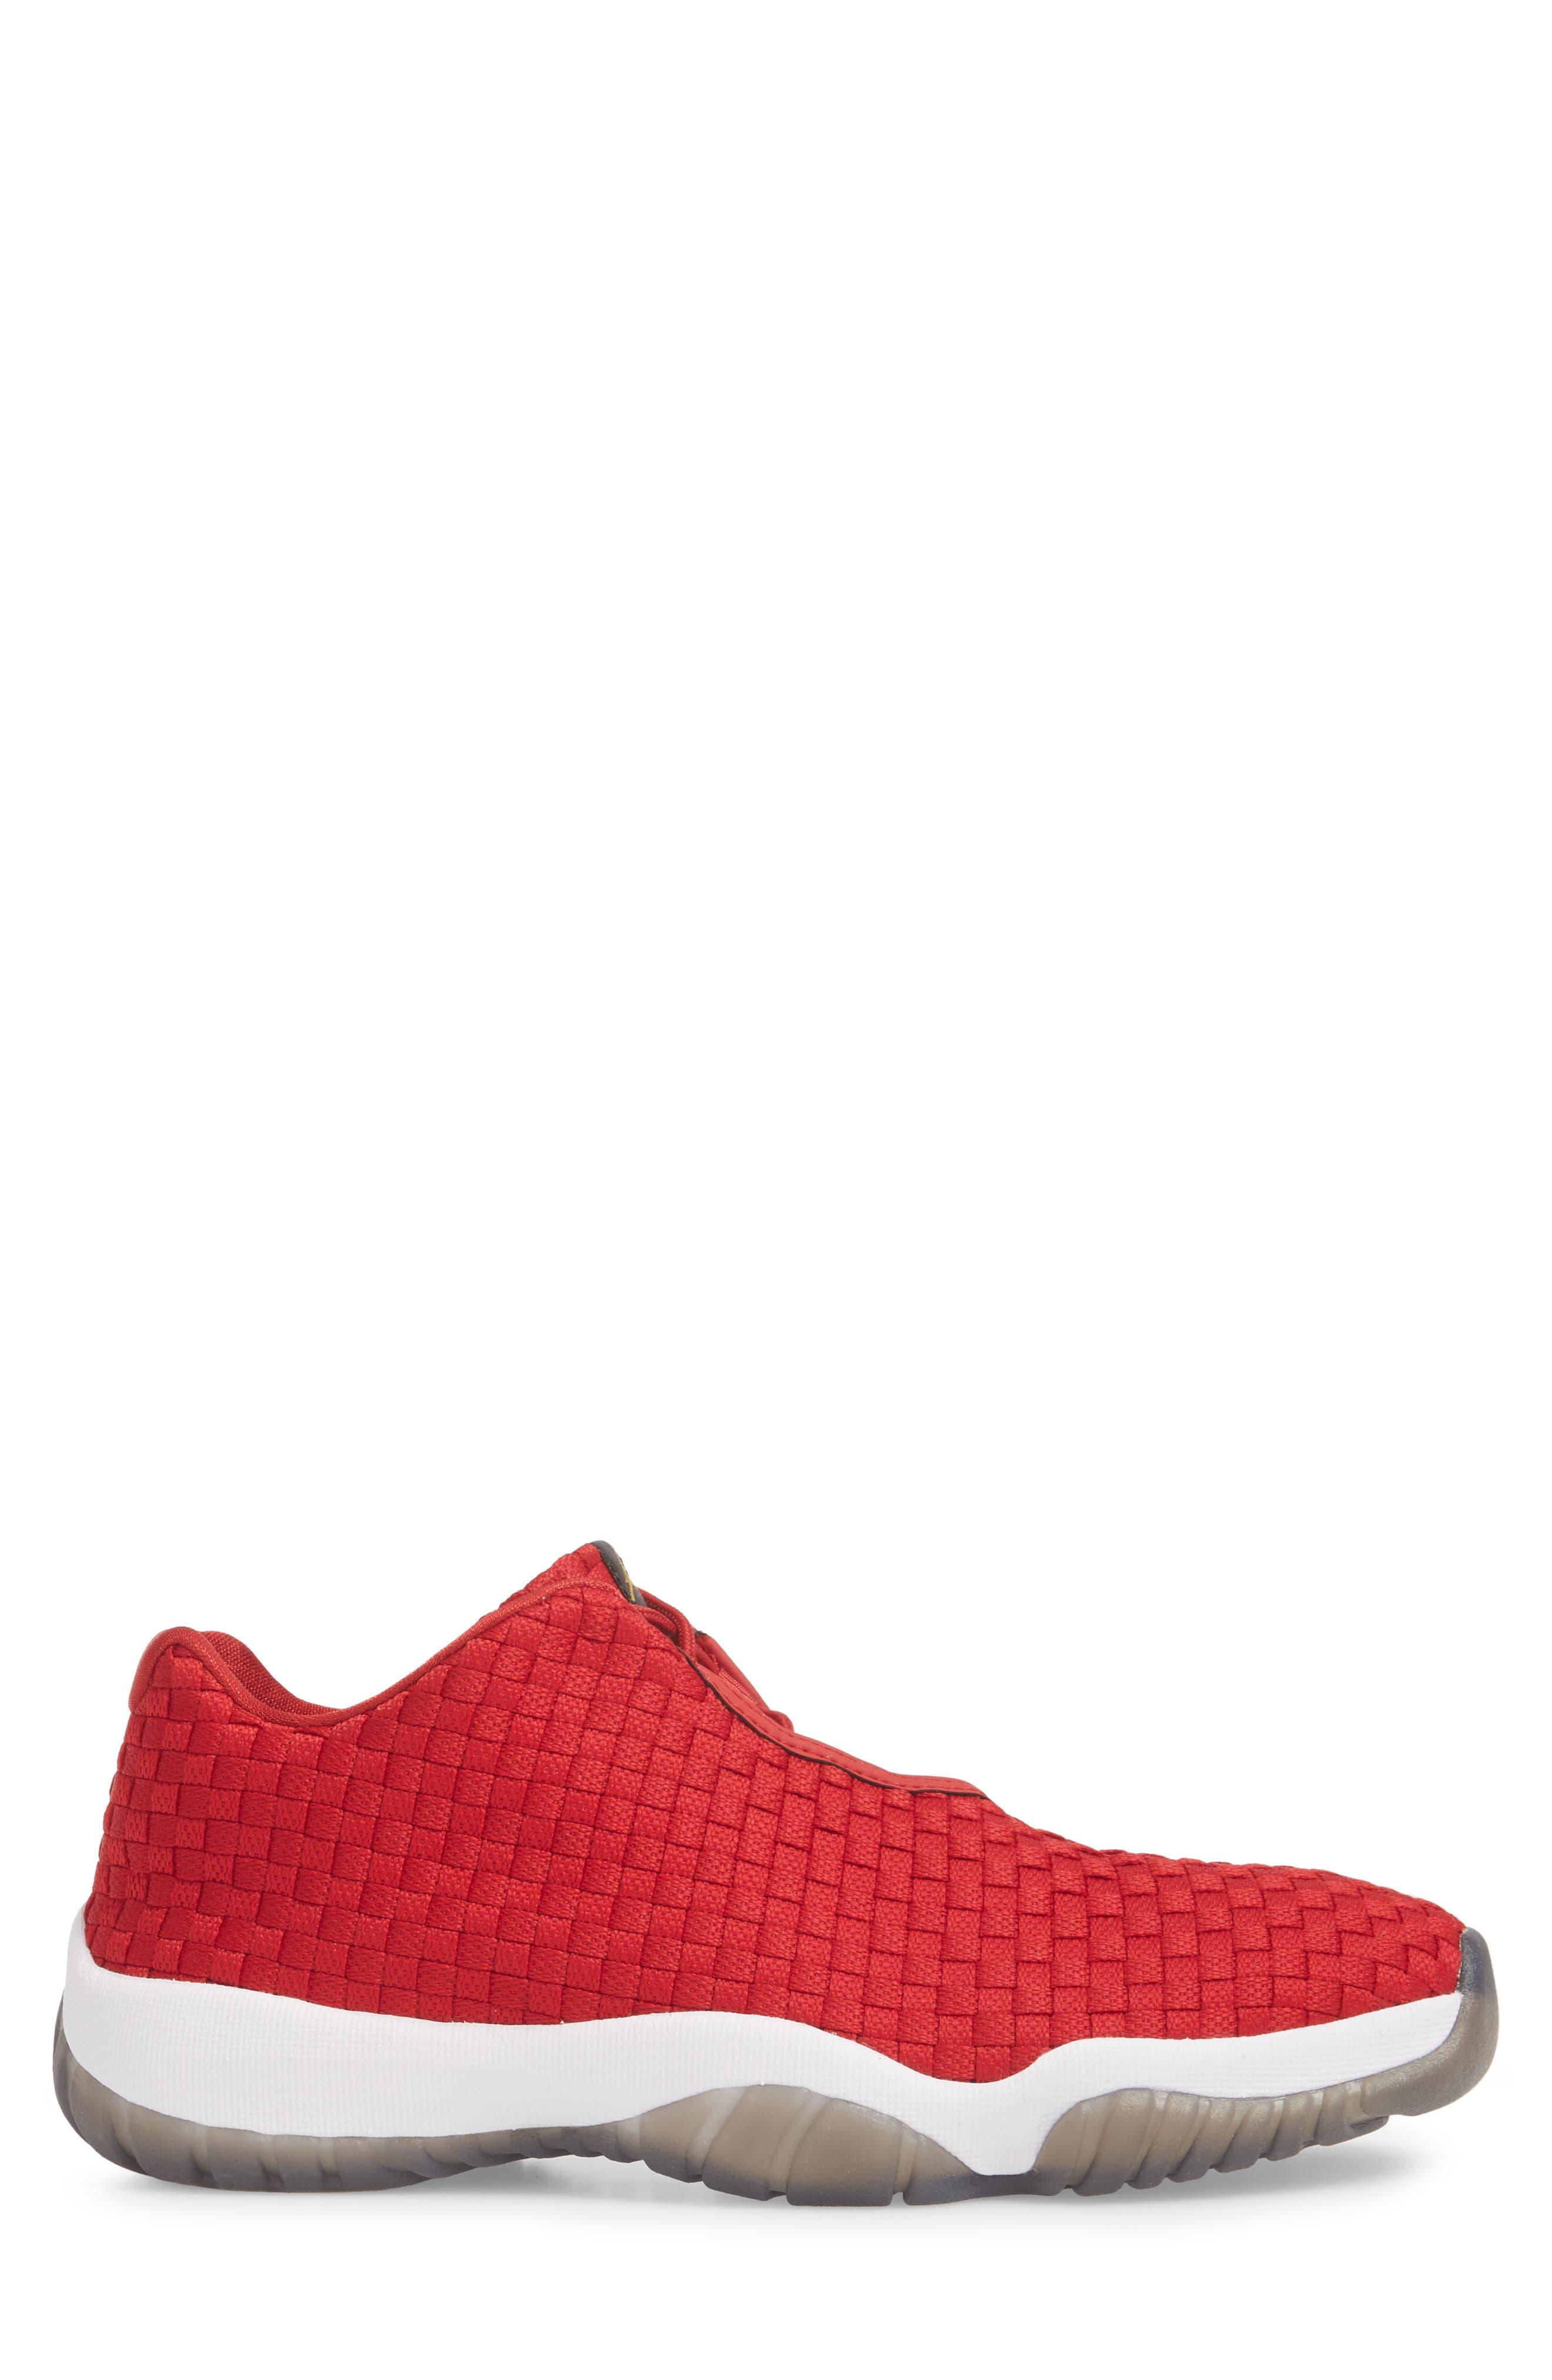 Air Jordan Future Woven Sneaker,                             Alternate thumbnail 3, color,                             Gym Red/ White/ Black